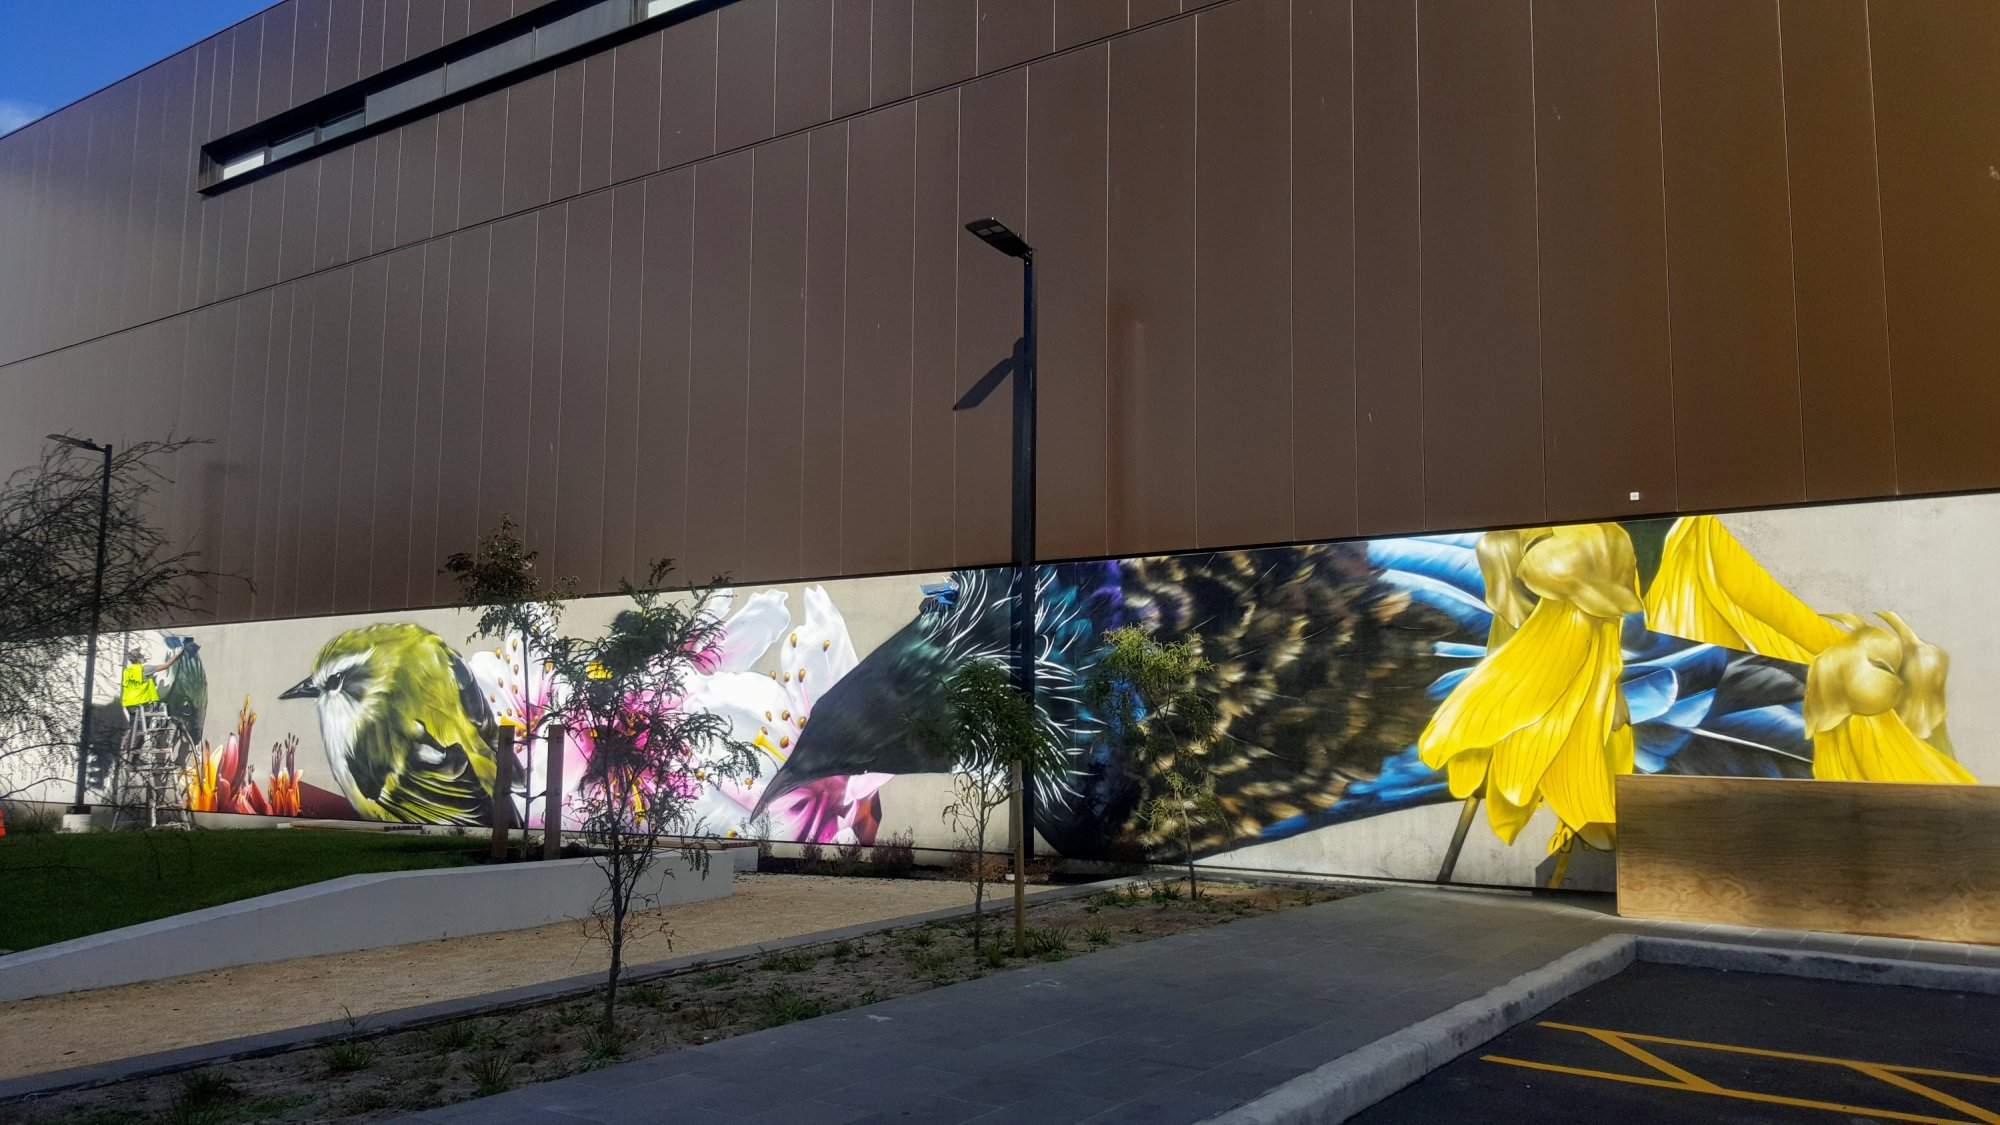 3-mural-being-painted-03